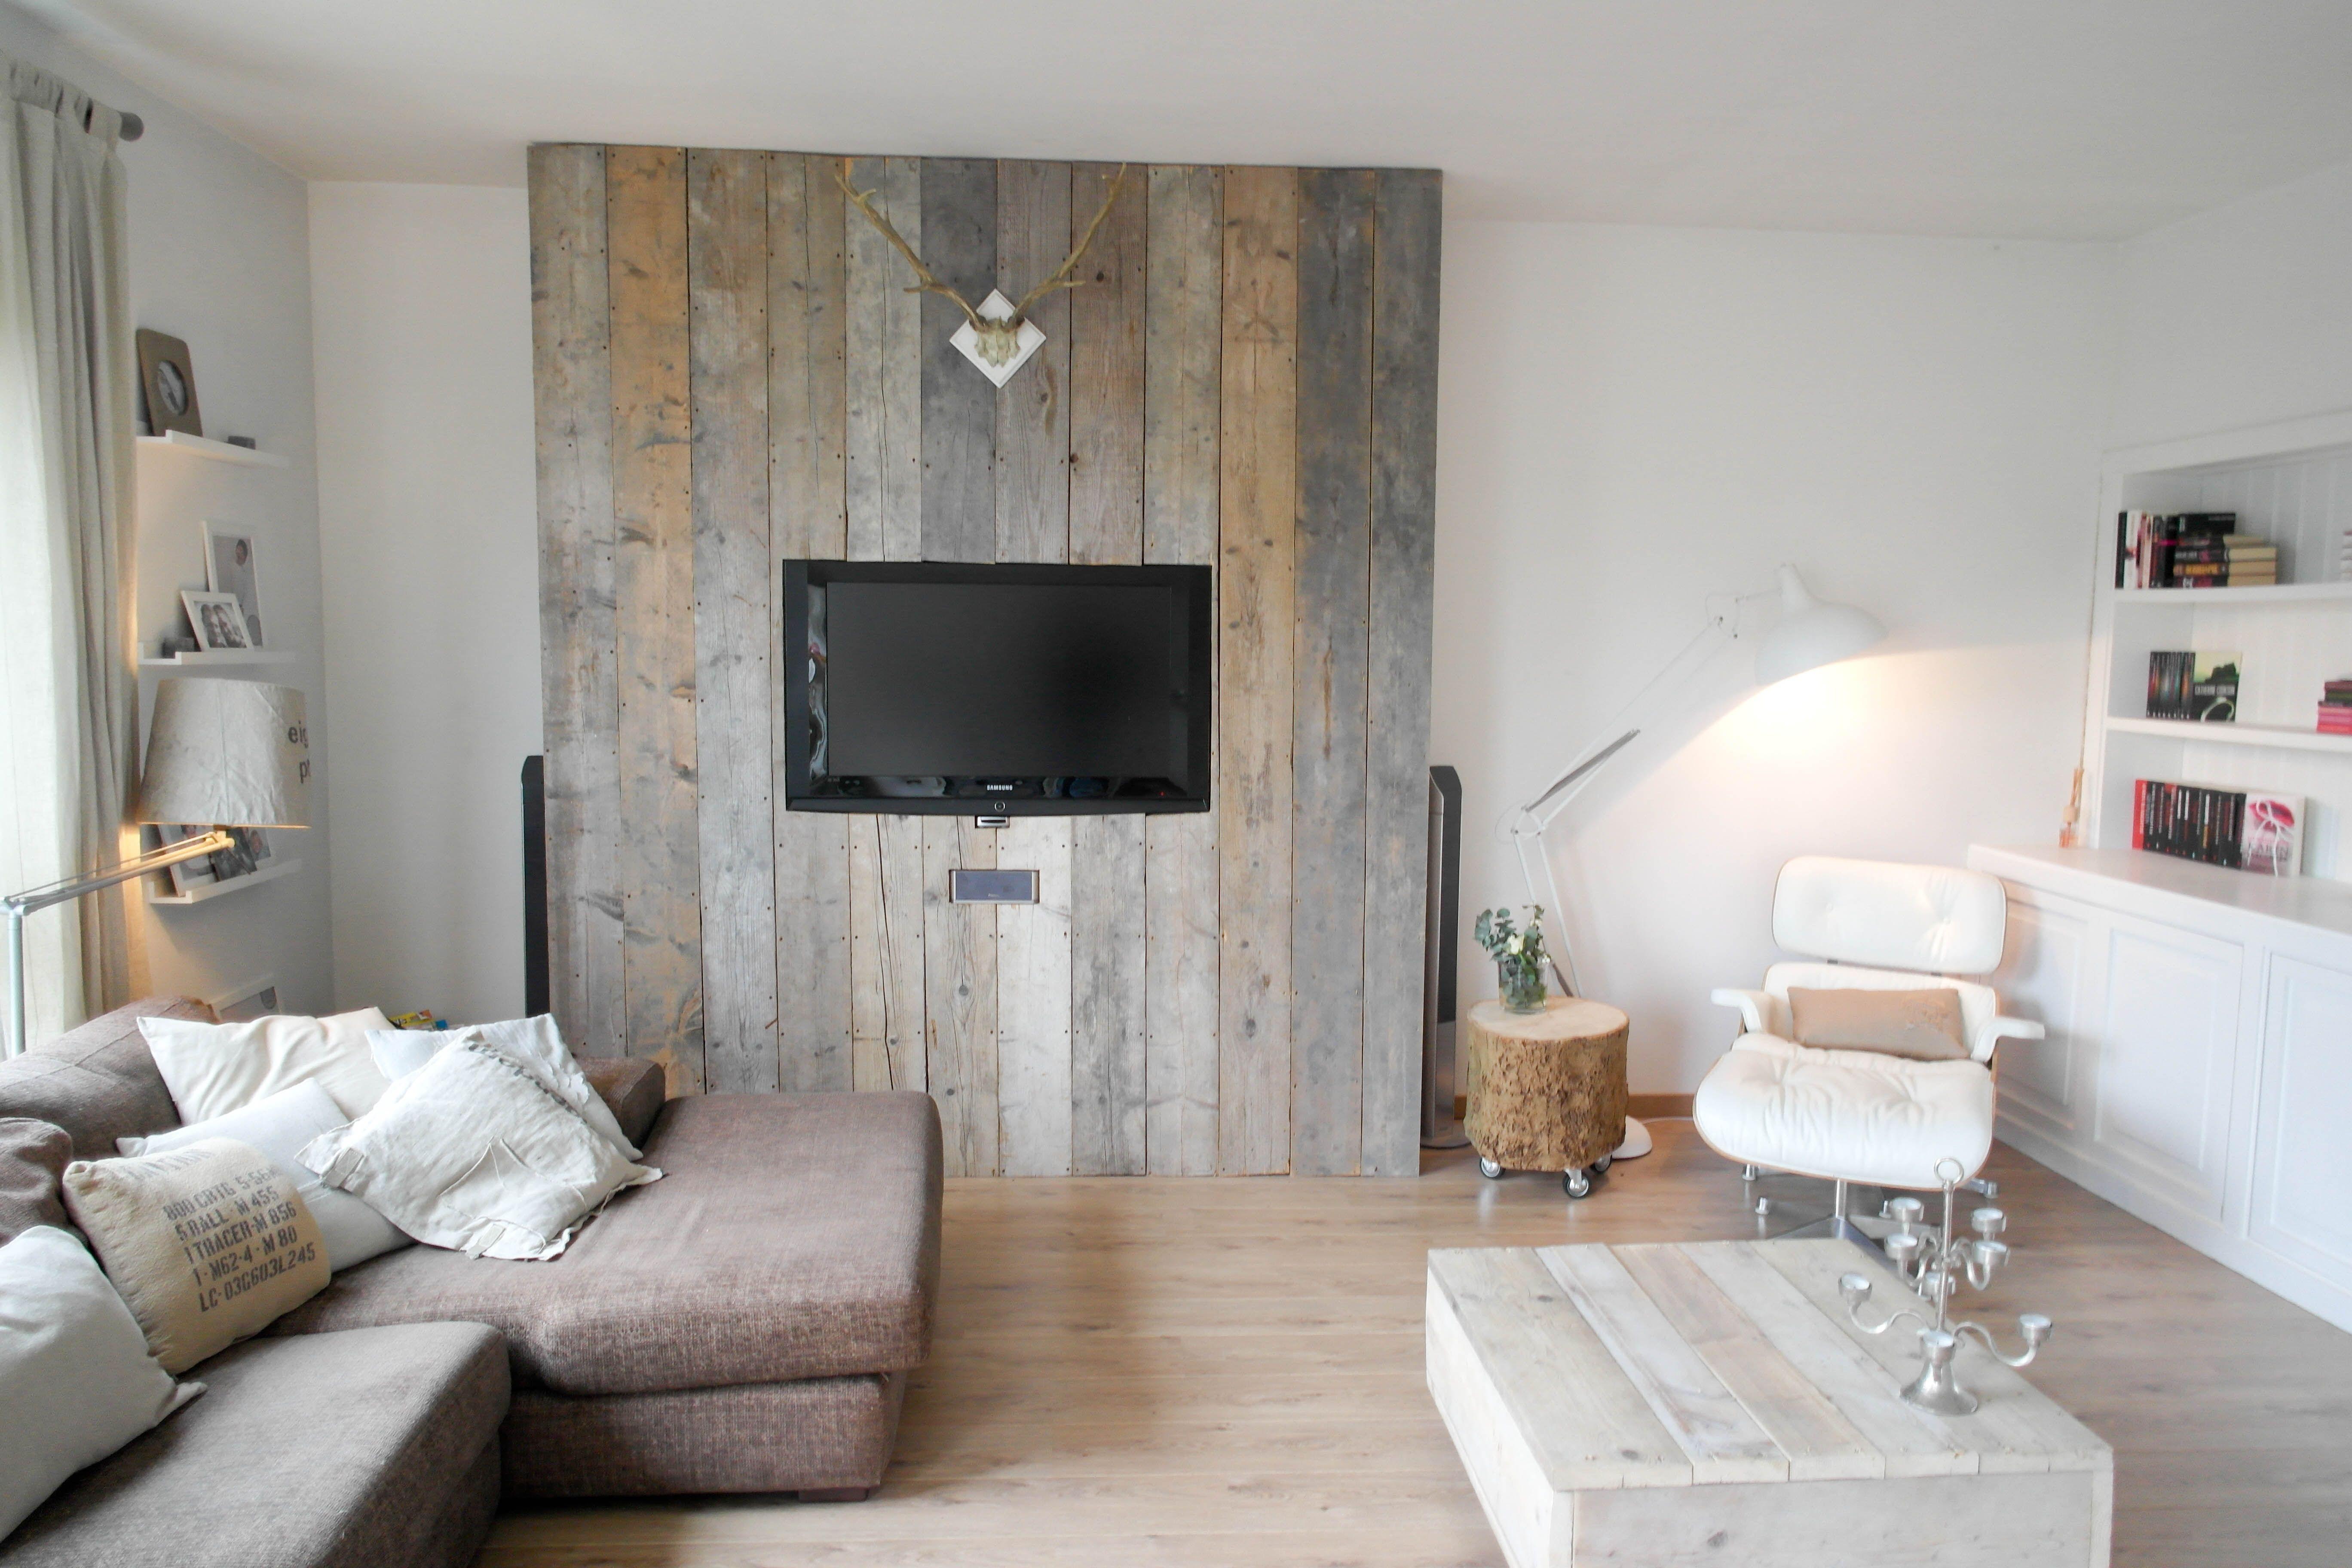 slaapkamer steigerhout - Google zoeken | zolder | Pinterest | Living ...